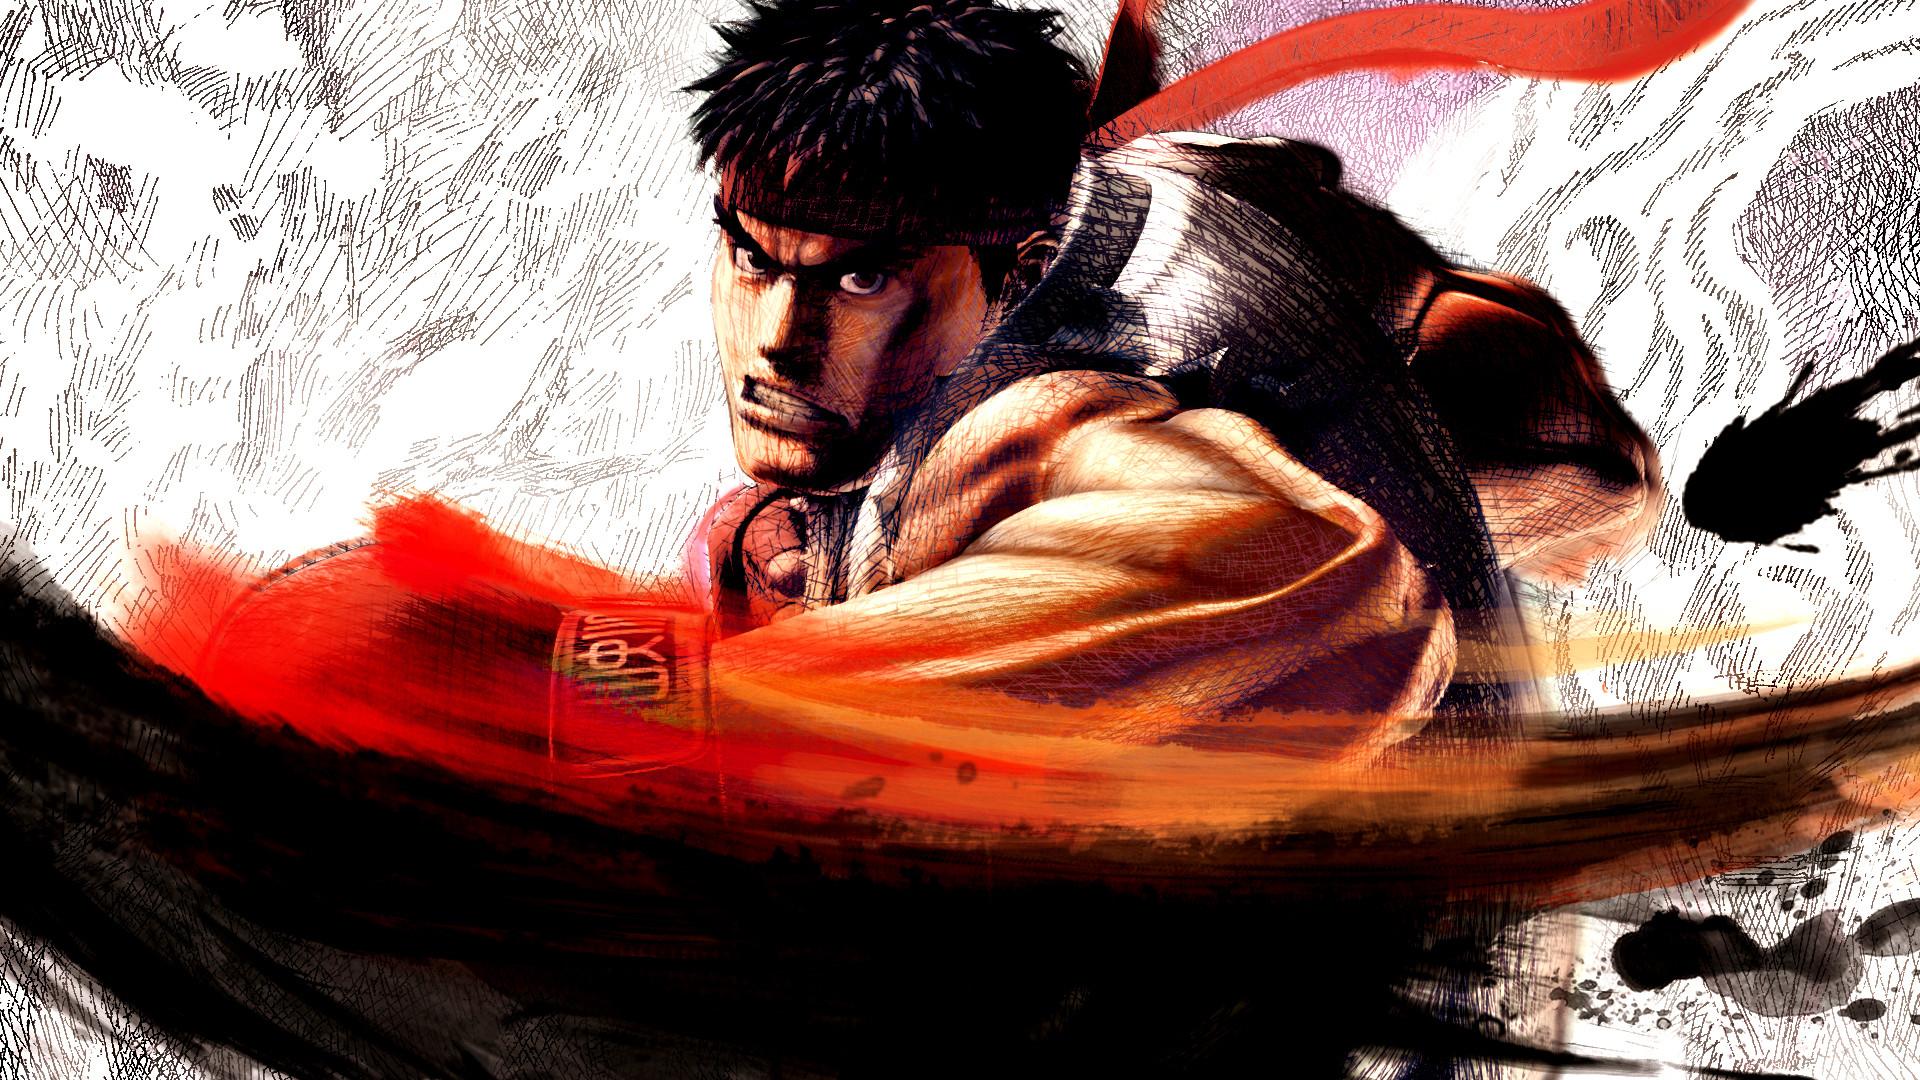 street, fighter, ryu, wallpaper, desktop, wallpapers, walls, best